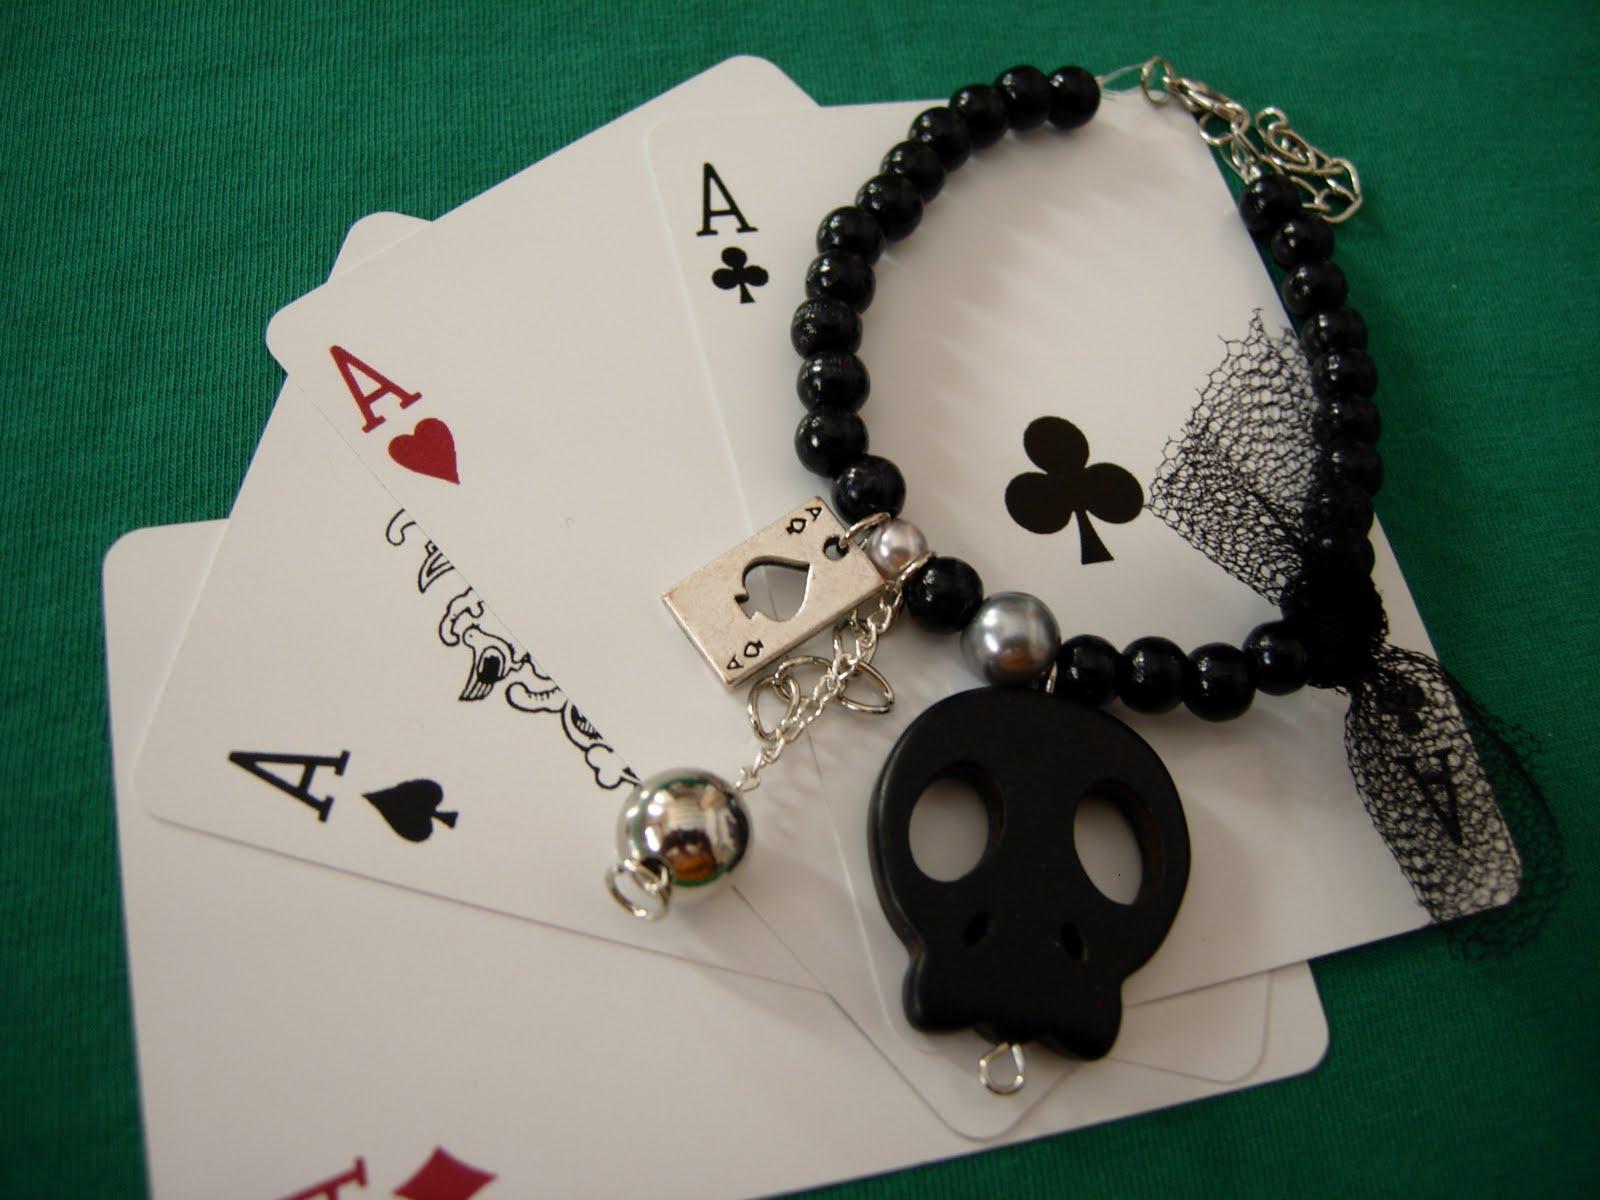 http://1.bp.blogspot.com/-2MbcZew2HYQ/TgmT1WgGF-I/AAAAAAAAAMA/T__hWFHEcrg/s1600/Ace+of+spades+bracelet.JPG